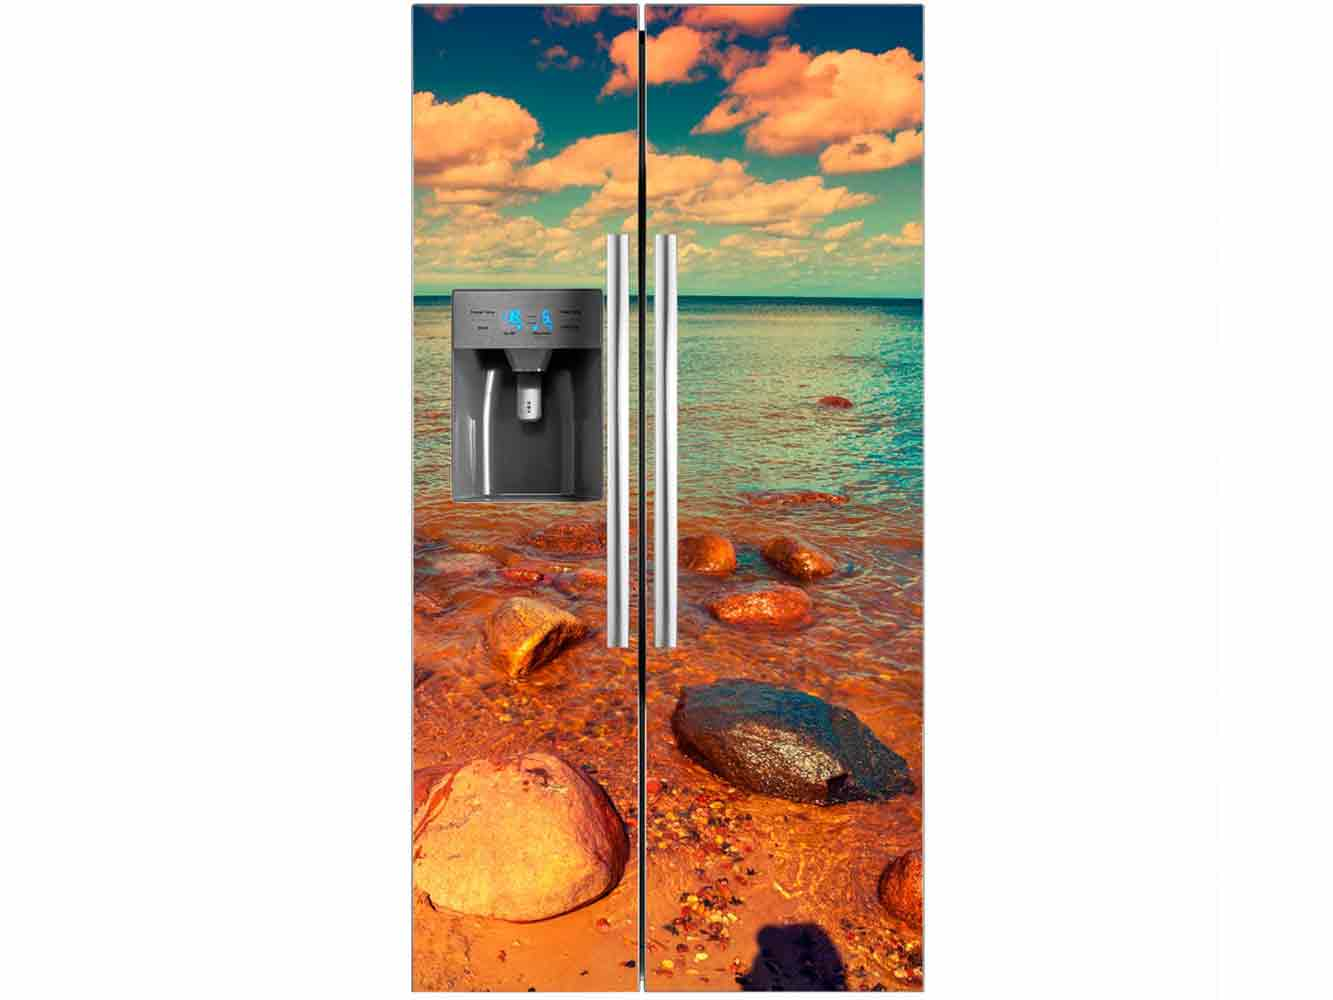 Vinilo Frigorífico Playa Rocosa | Carteles XXL - Impresión carteleria publicitaria